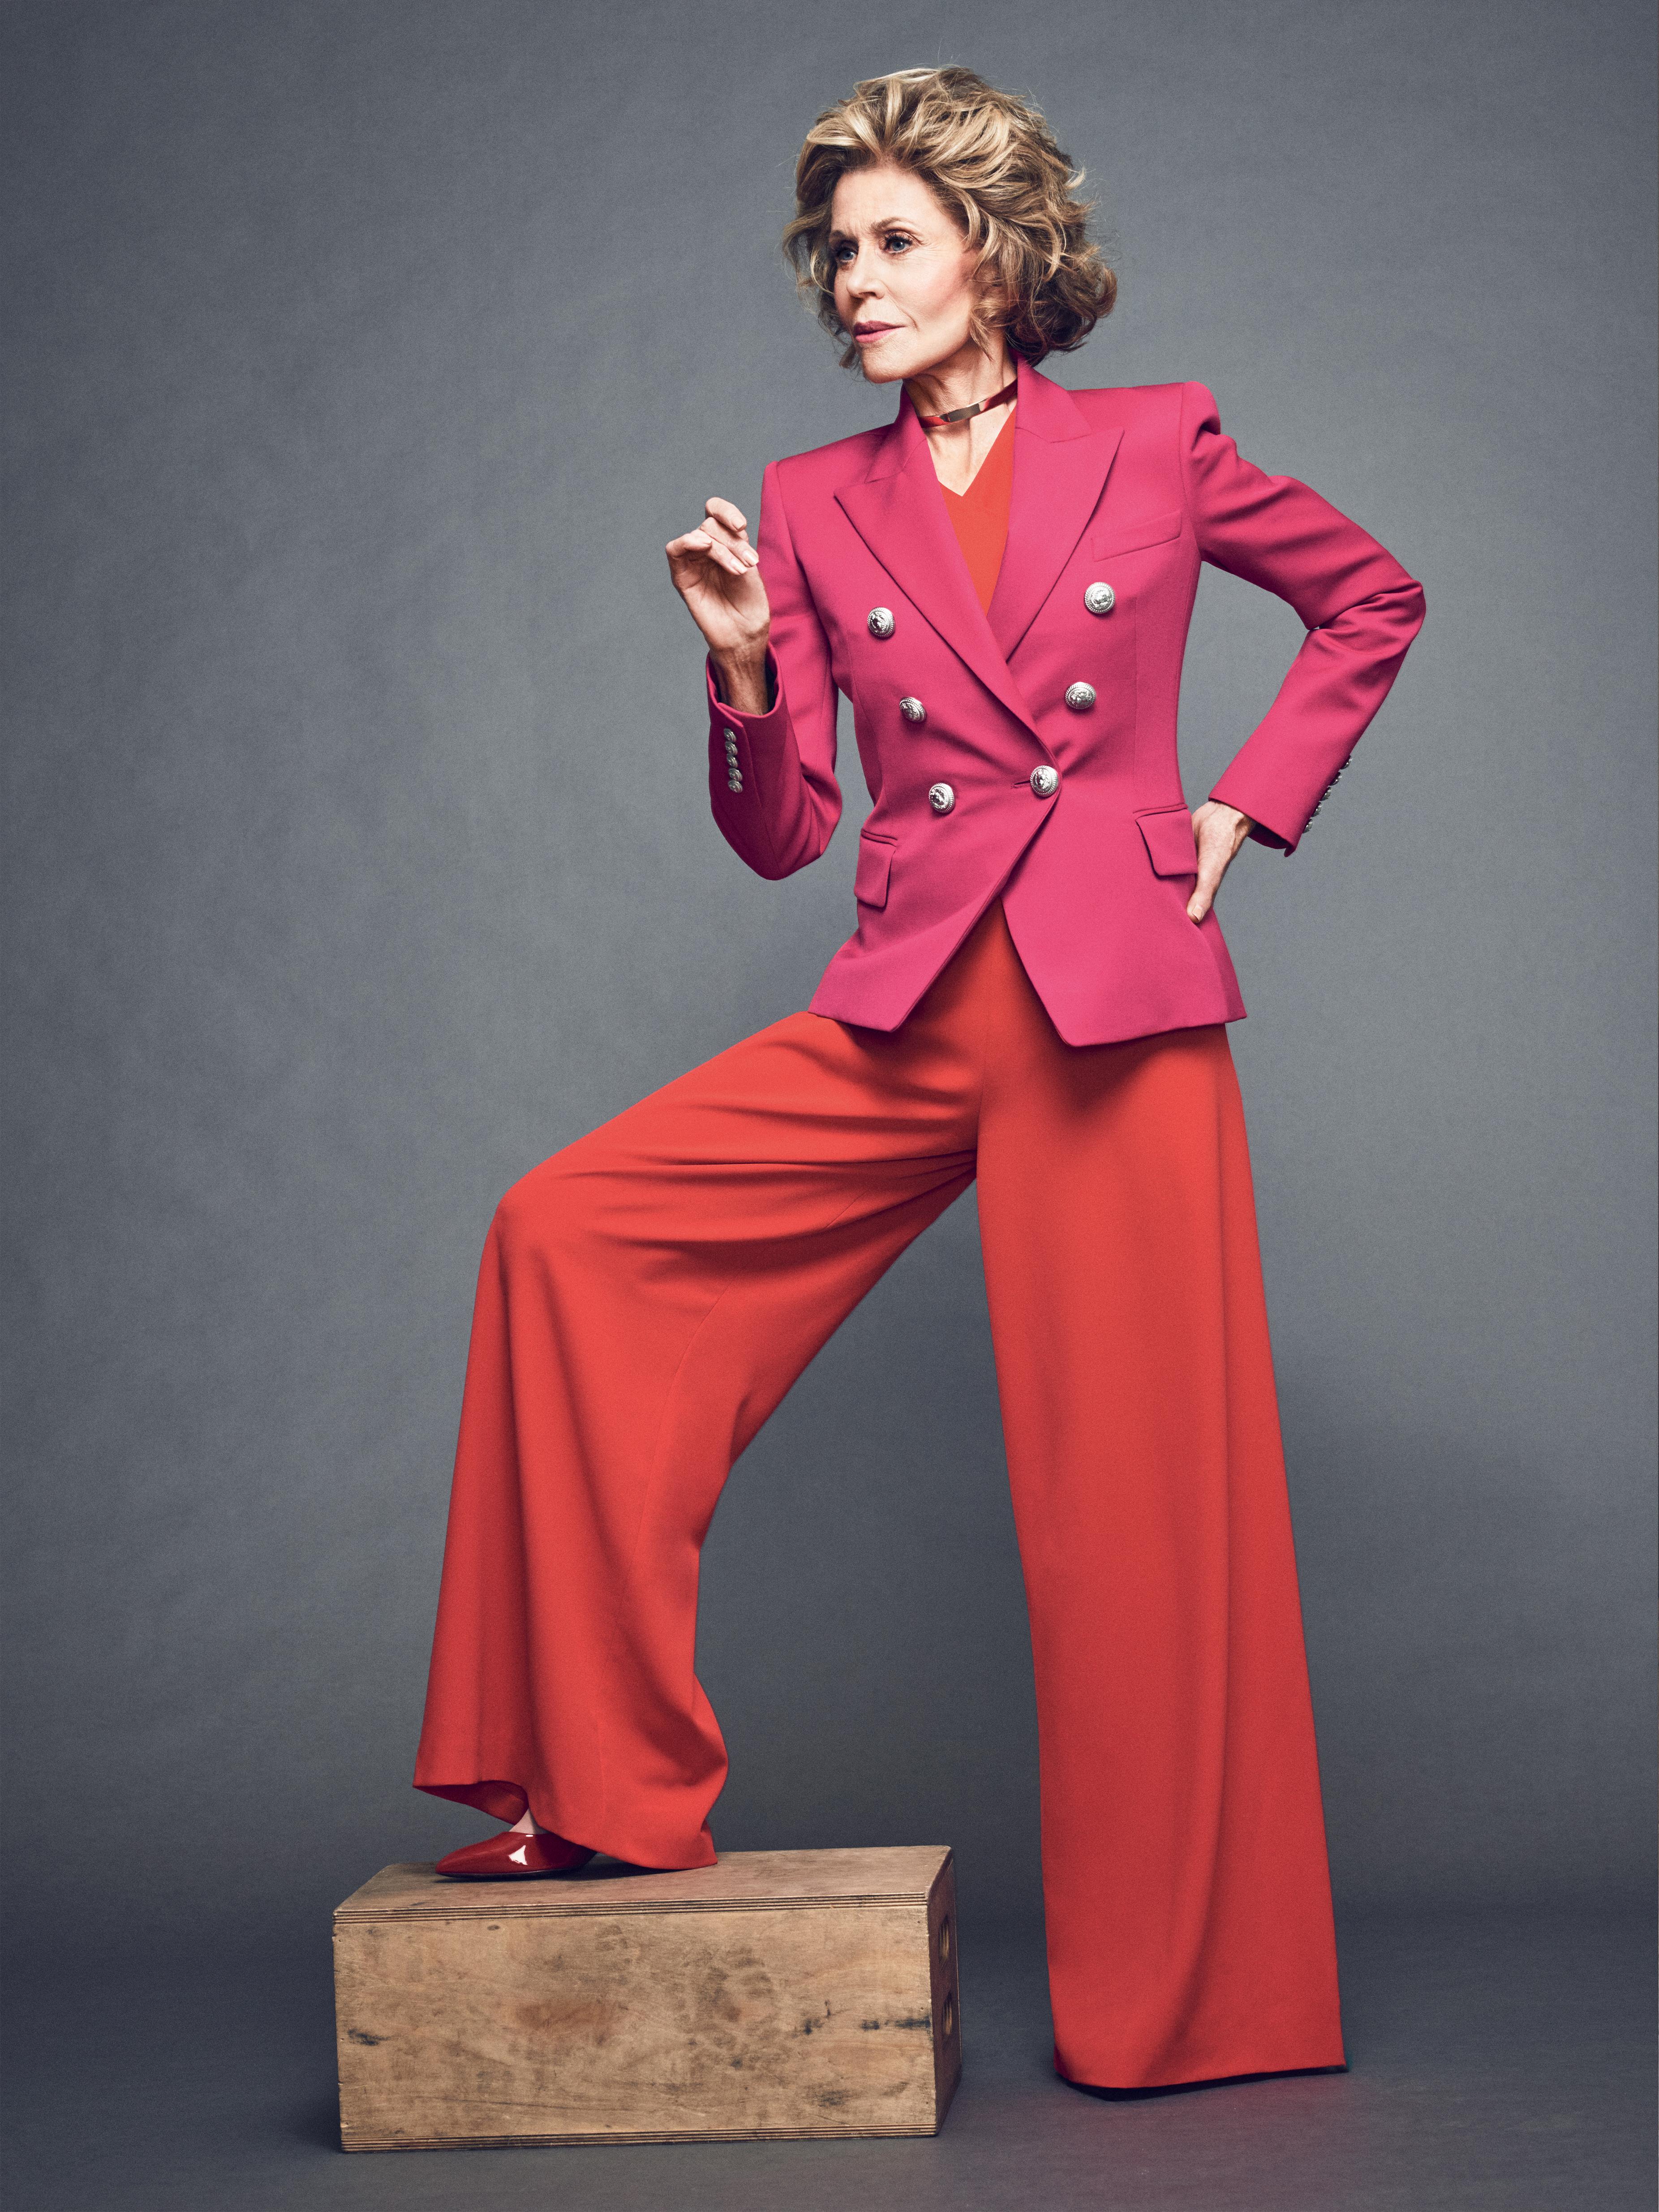 Jane Fonda Talks Activism & Empowerment With Brie Larson | PORTER